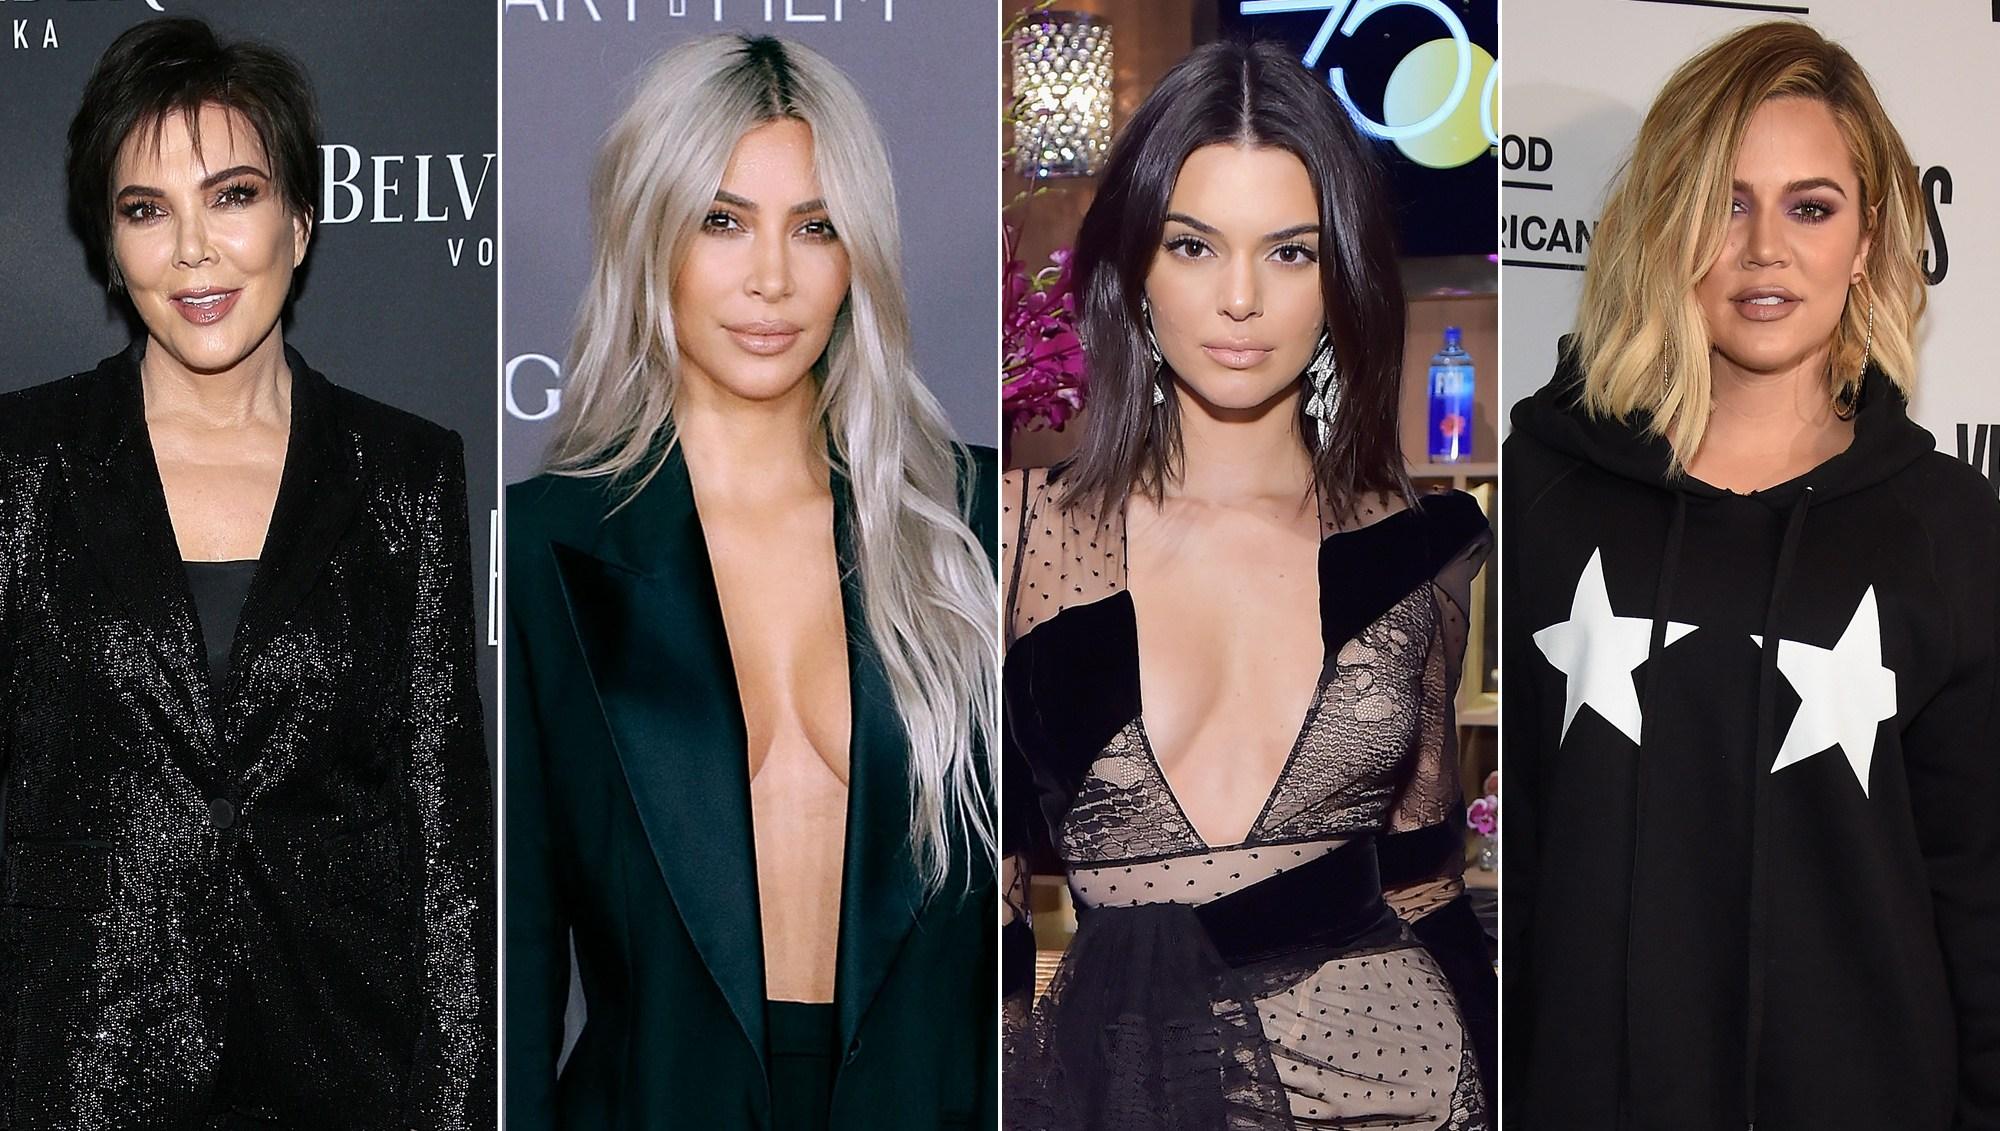 Kris Jenner, Kim Kardashian, Kendall Jenner and Khloe Kardashian